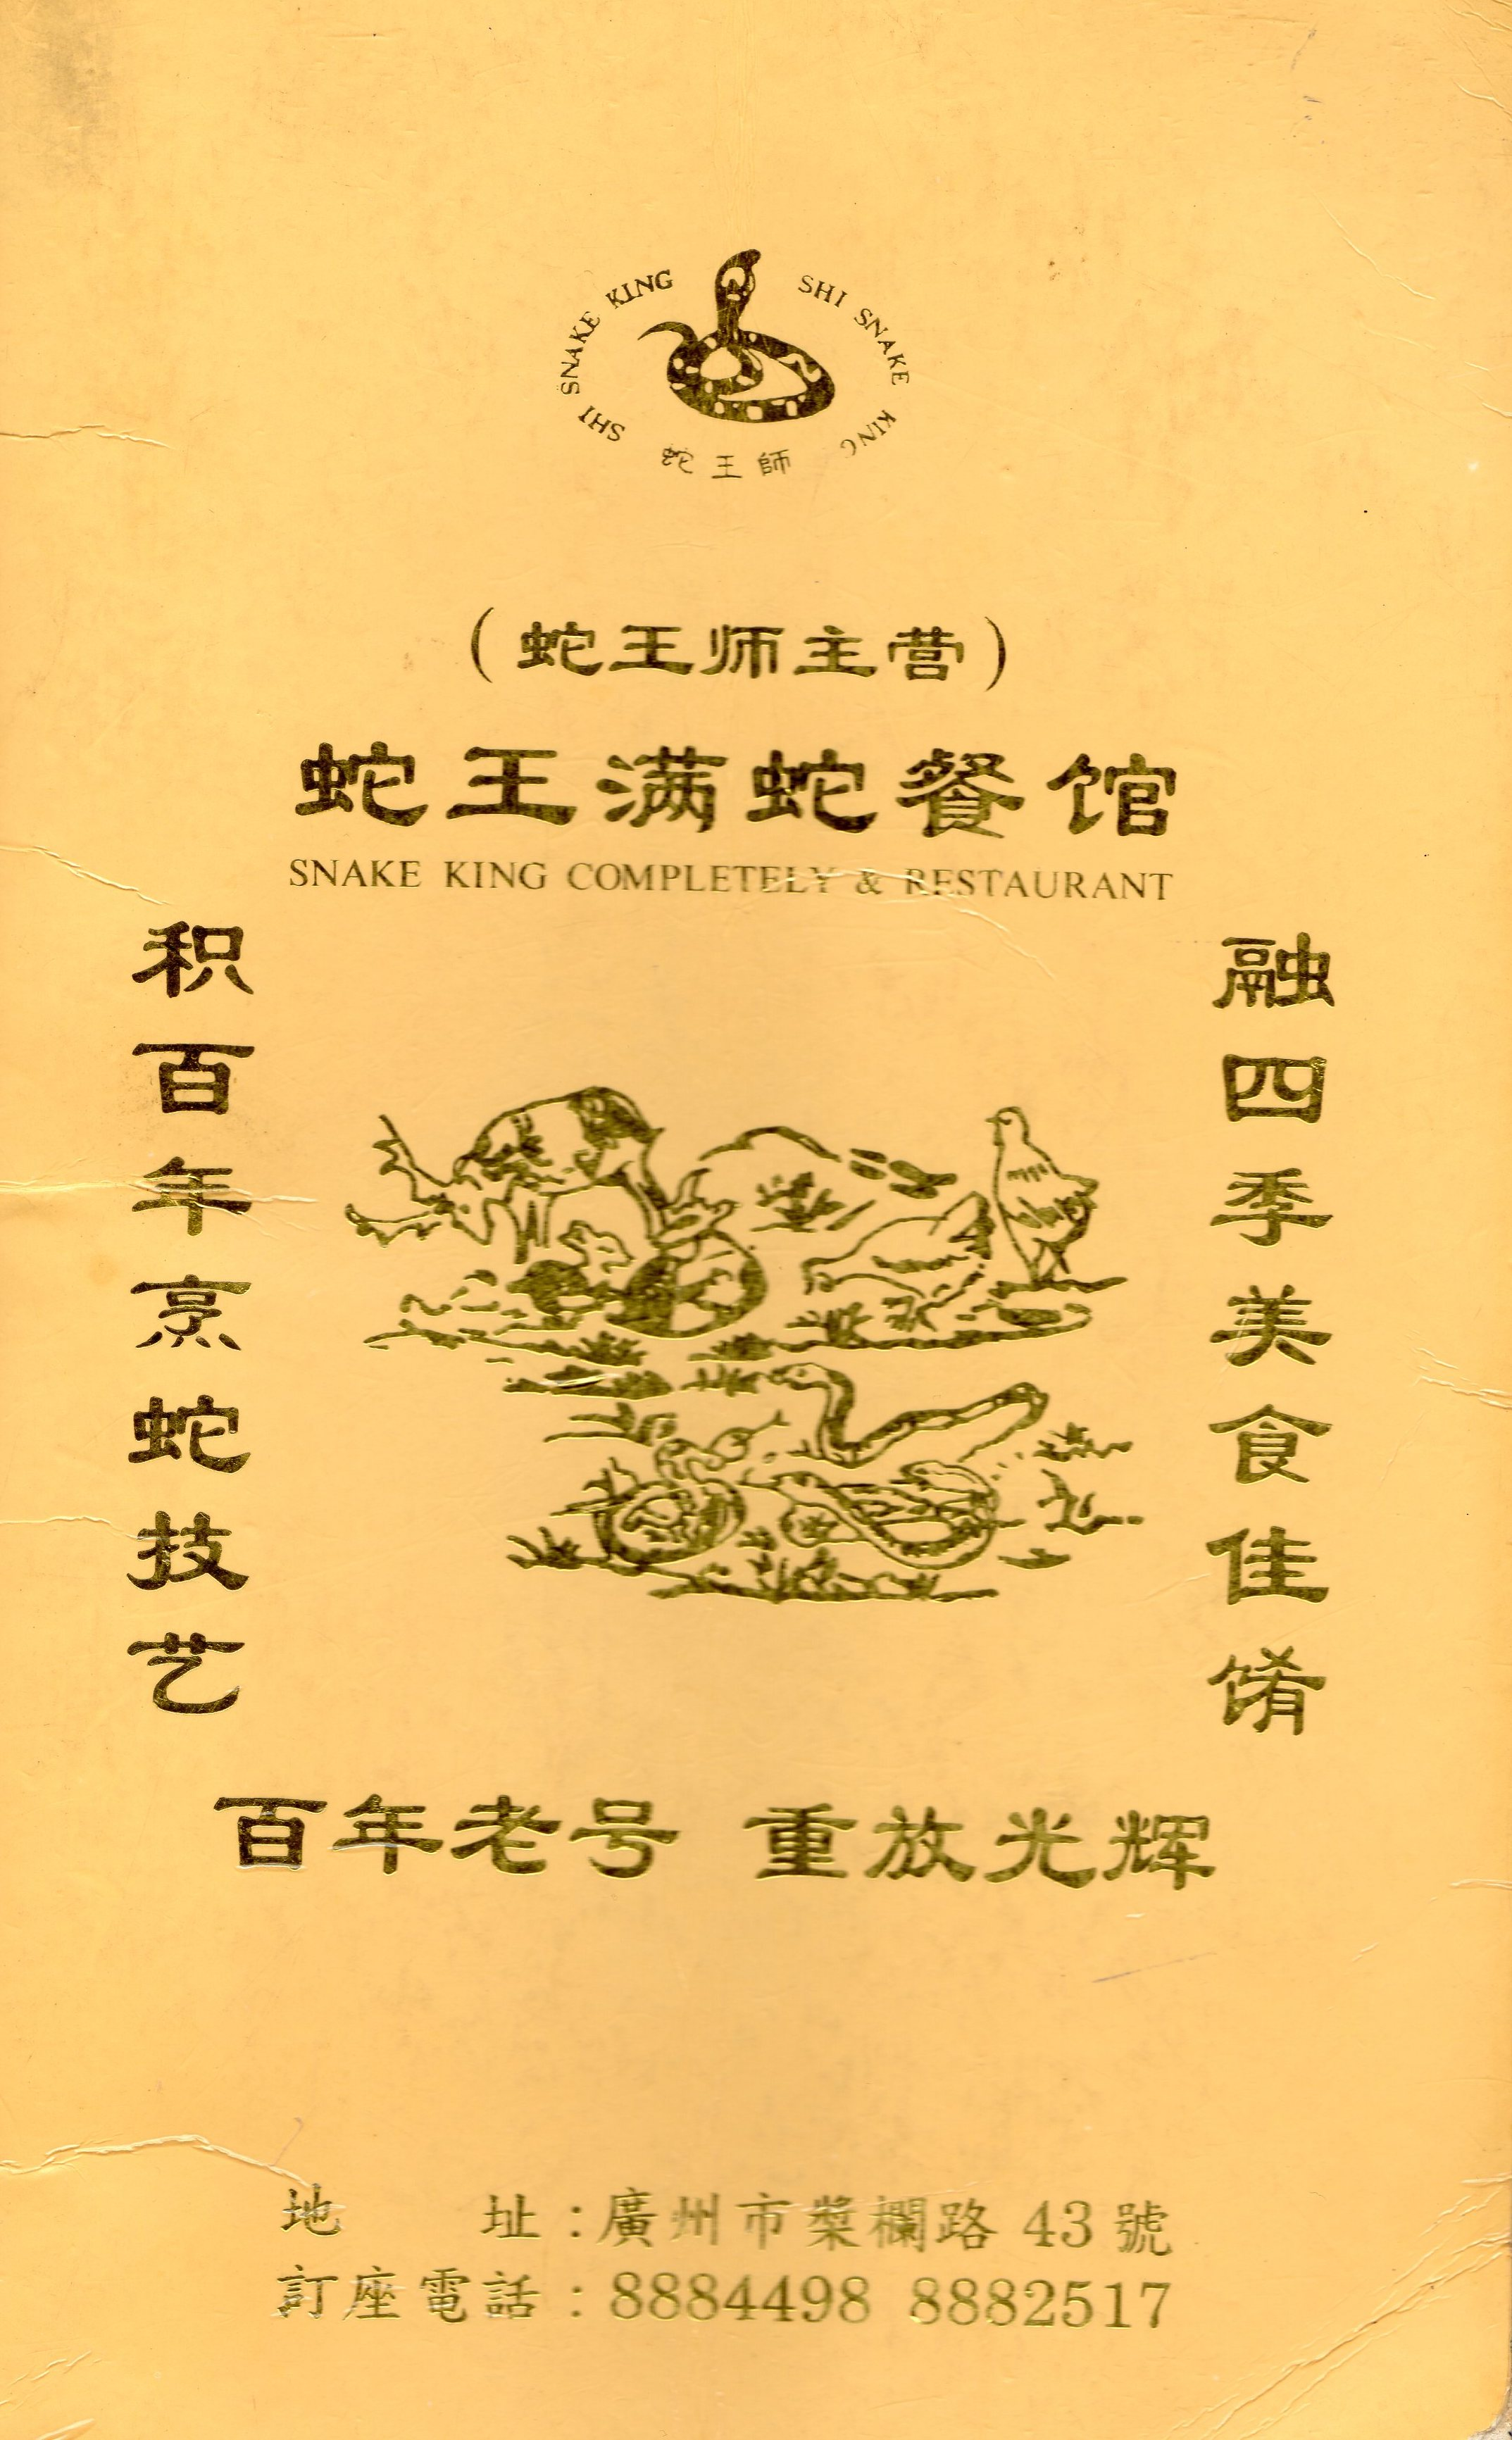 Cantonese Snake Restaurant Menu Cover